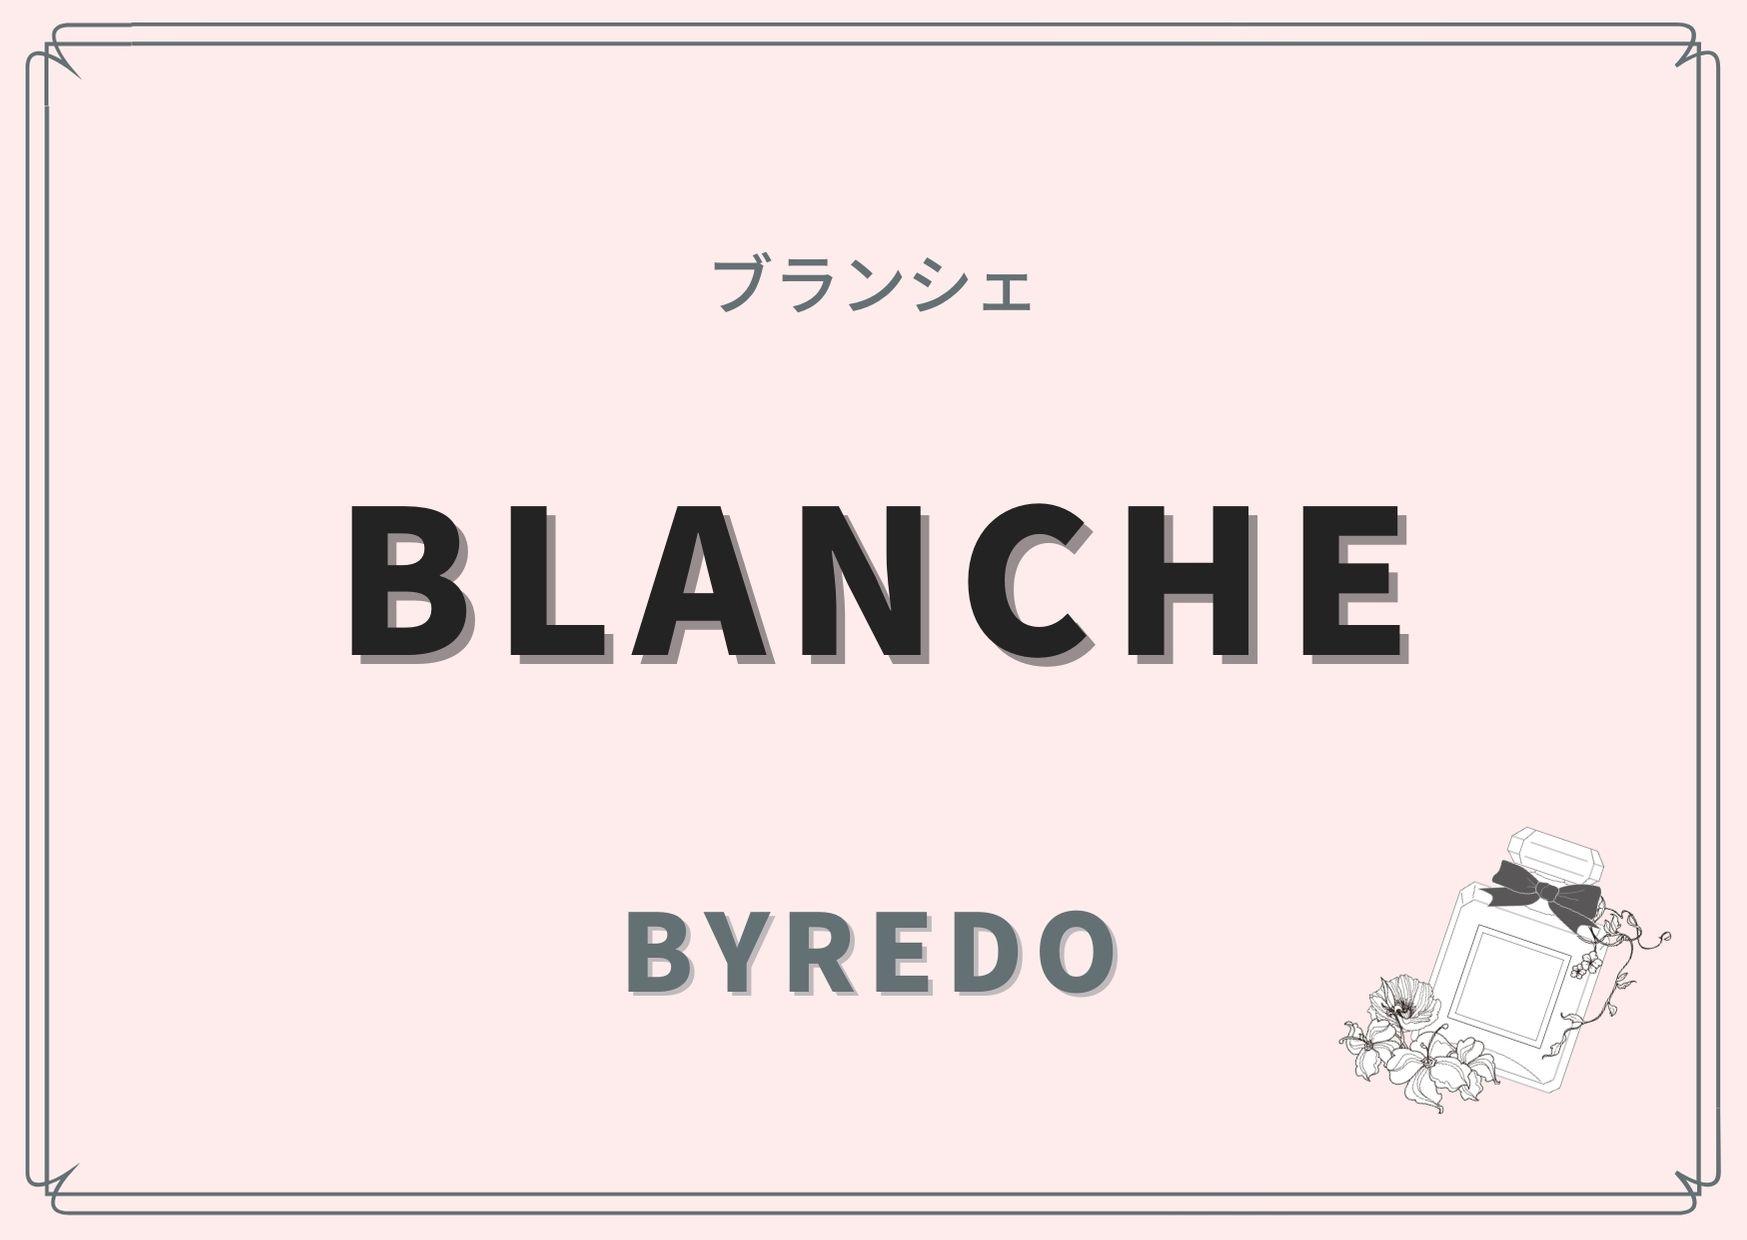 BLANCHE(ブランシェ)/ BYREDO(バイレード)